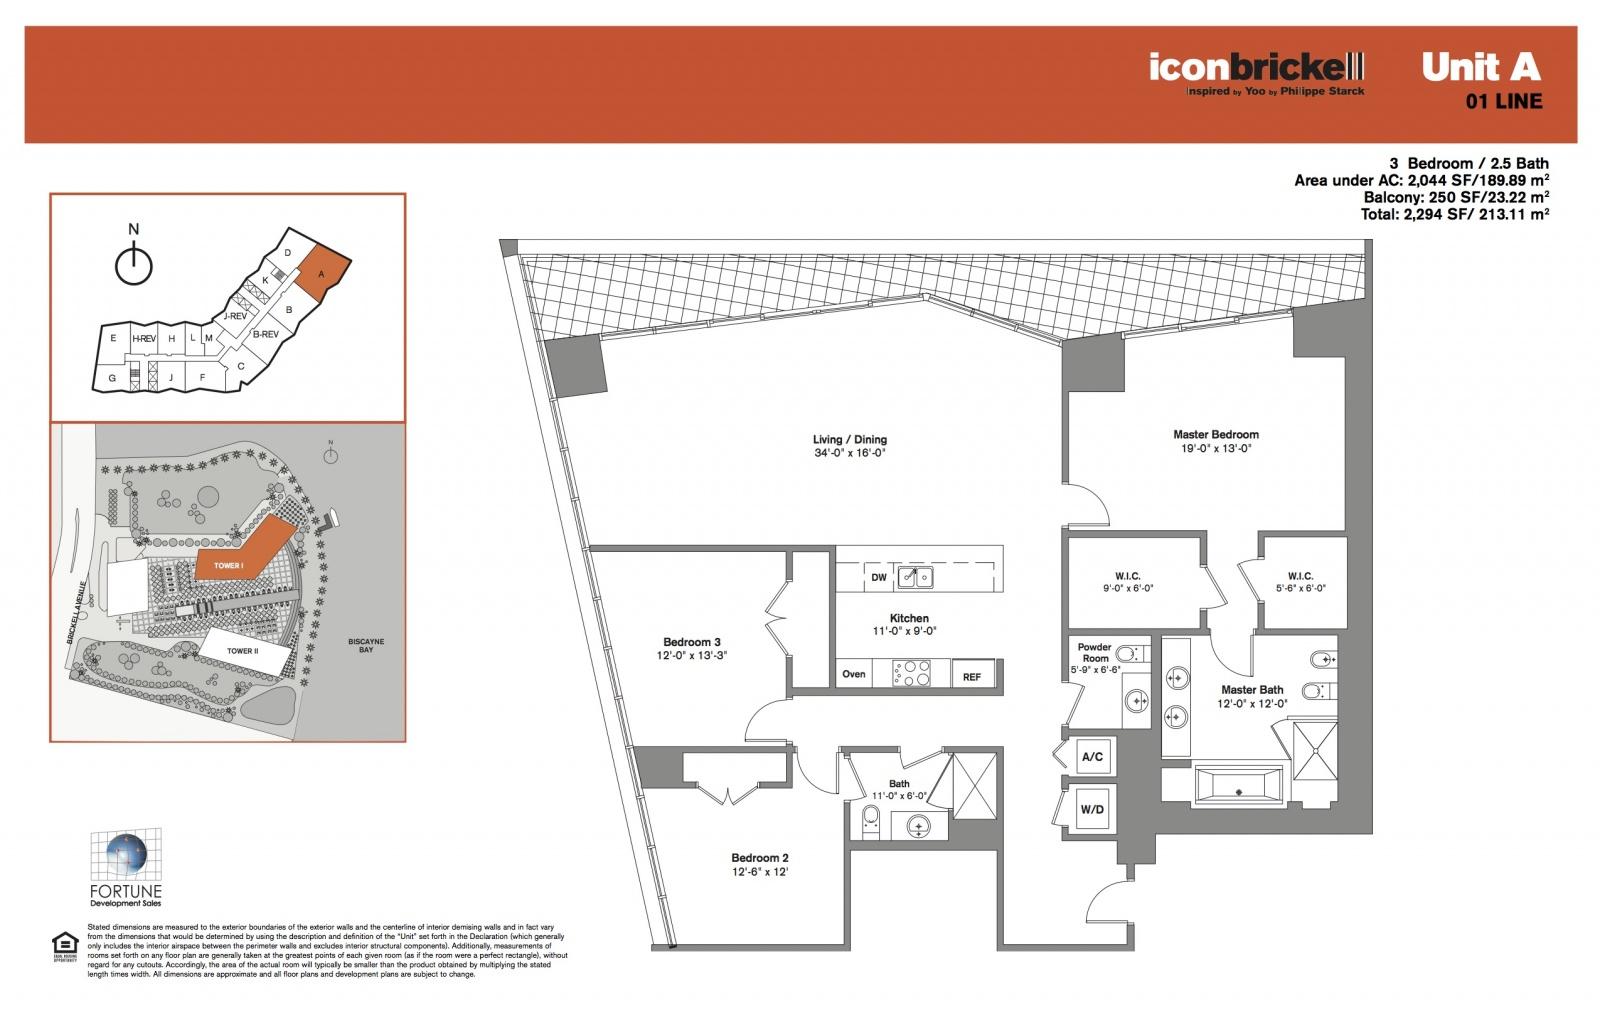 Icon Brickell One Line 1 floor plan